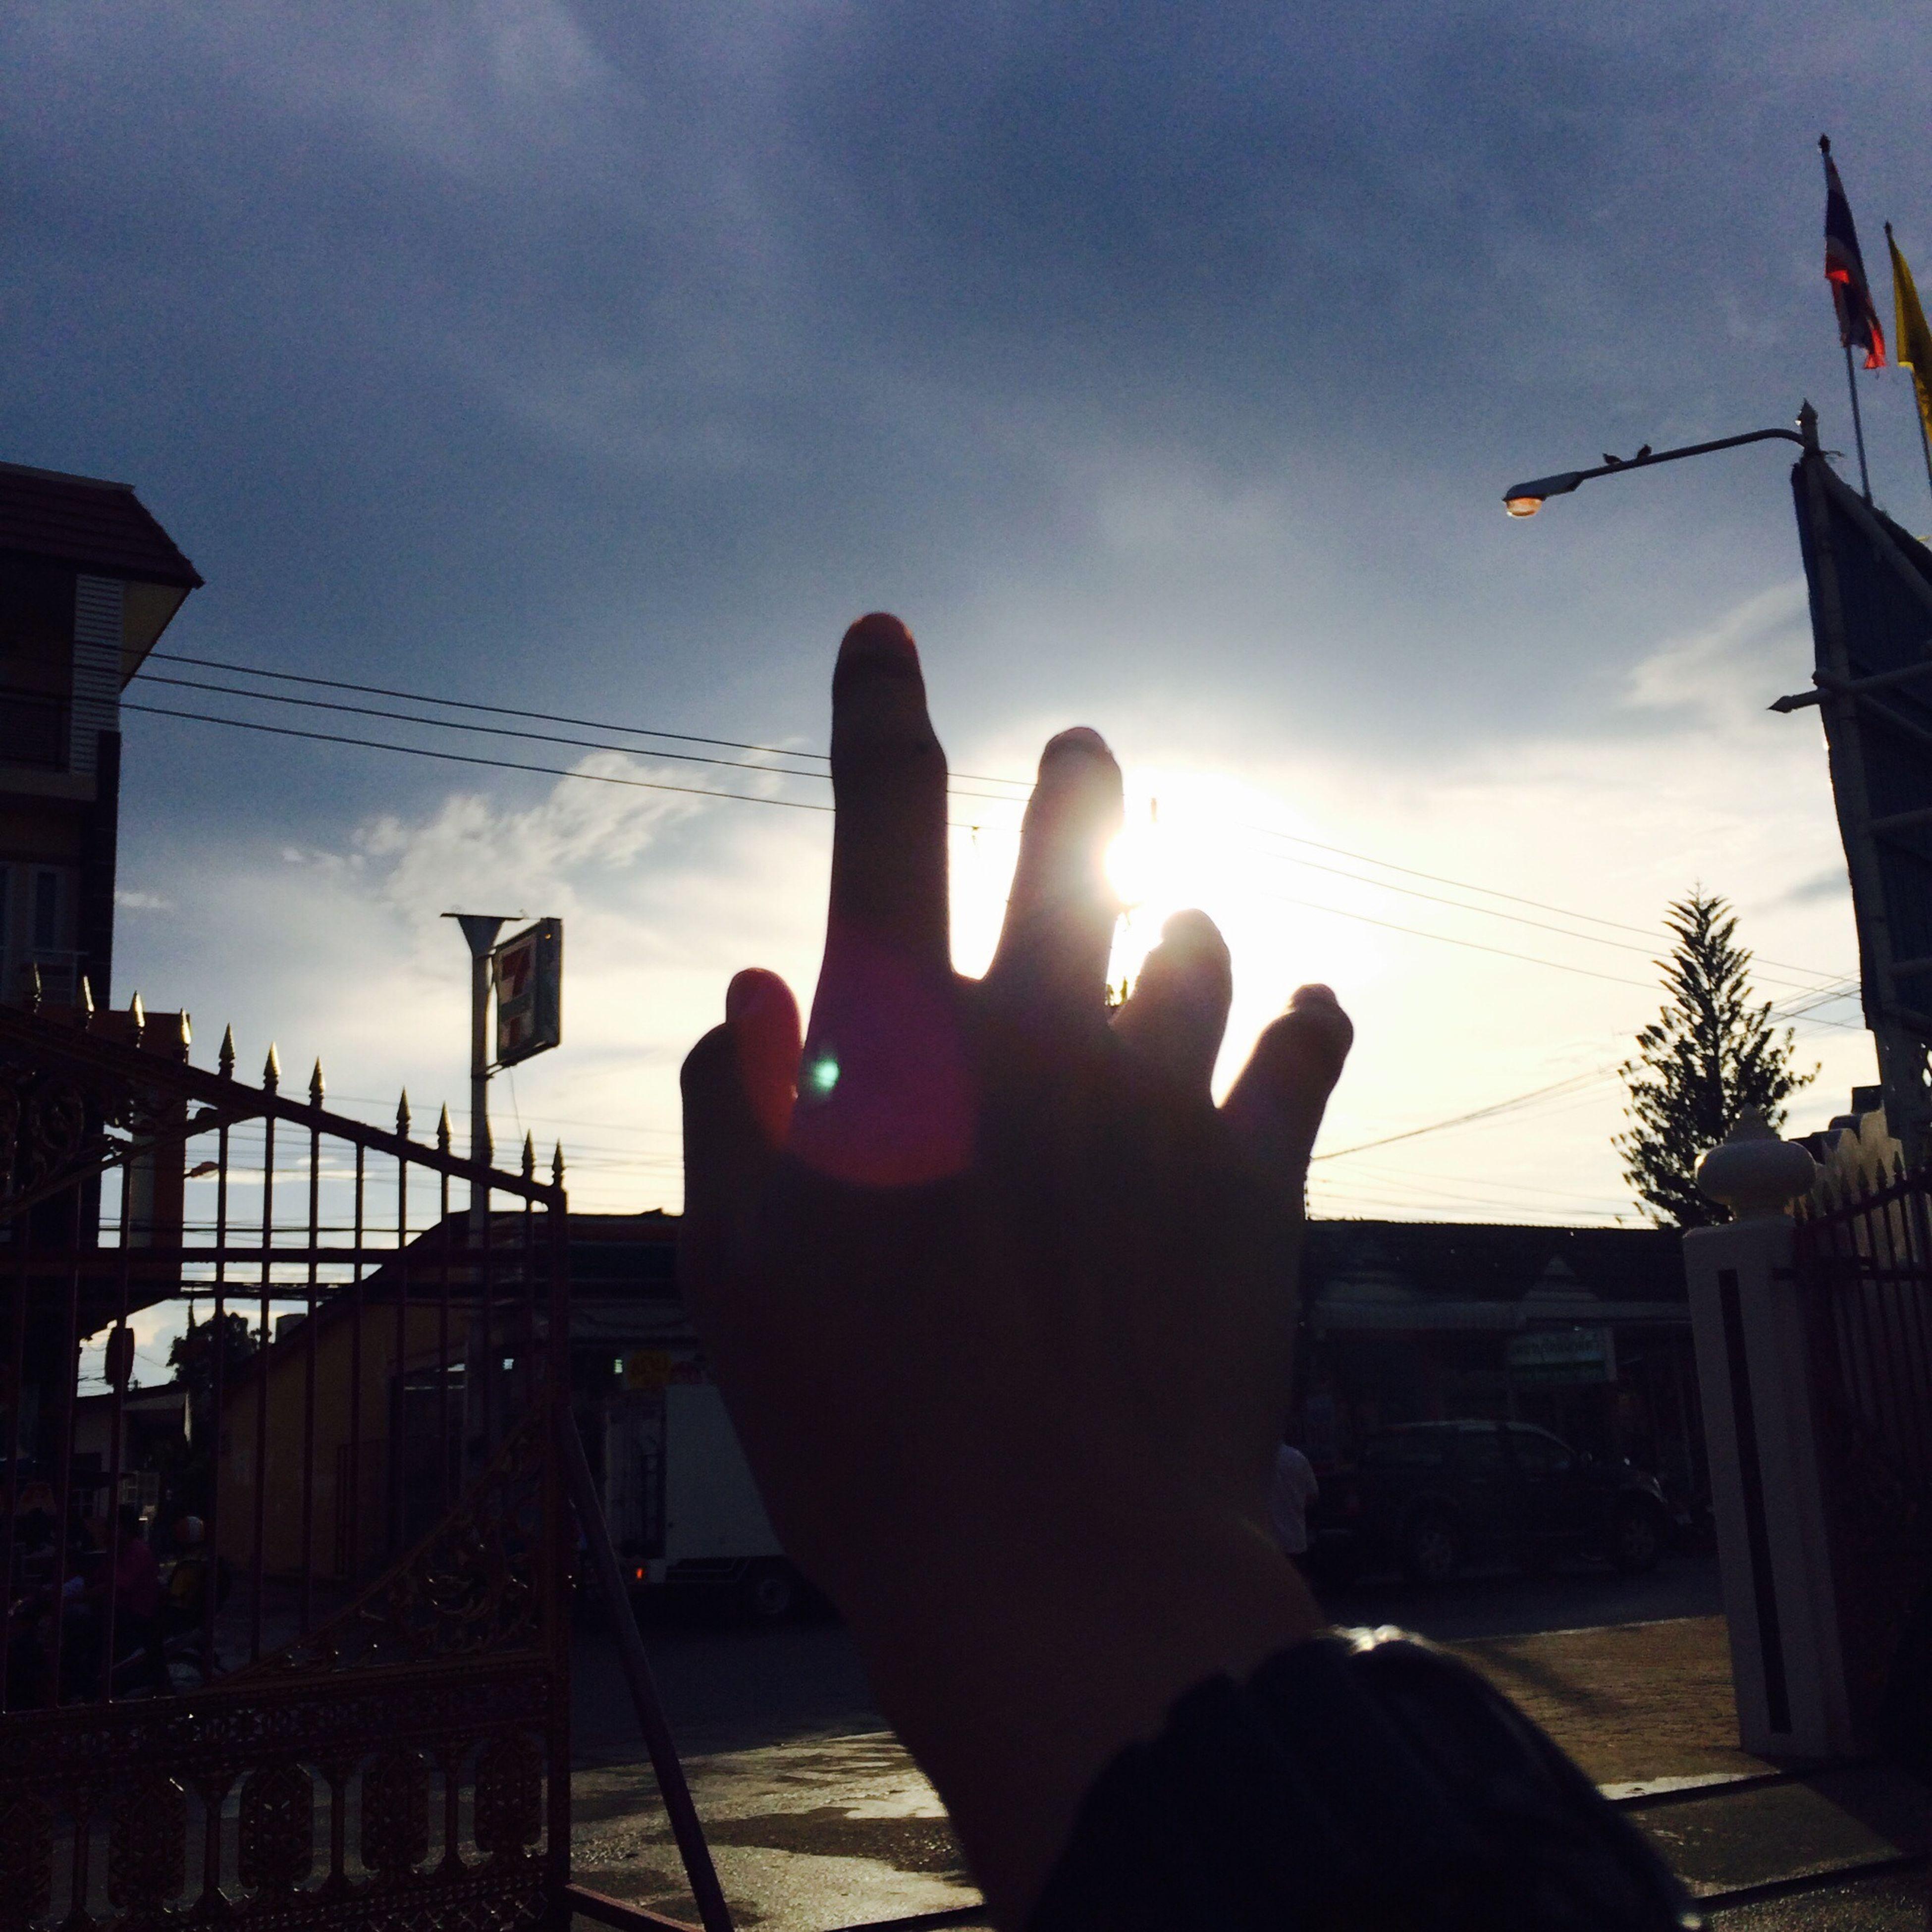 person, sky, part of, silhouette, sunset, cropped, lifestyles, built structure, human finger, building exterior, unrecognizable person, cloud - sky, holding, architecture, cloud, leisure activity, men